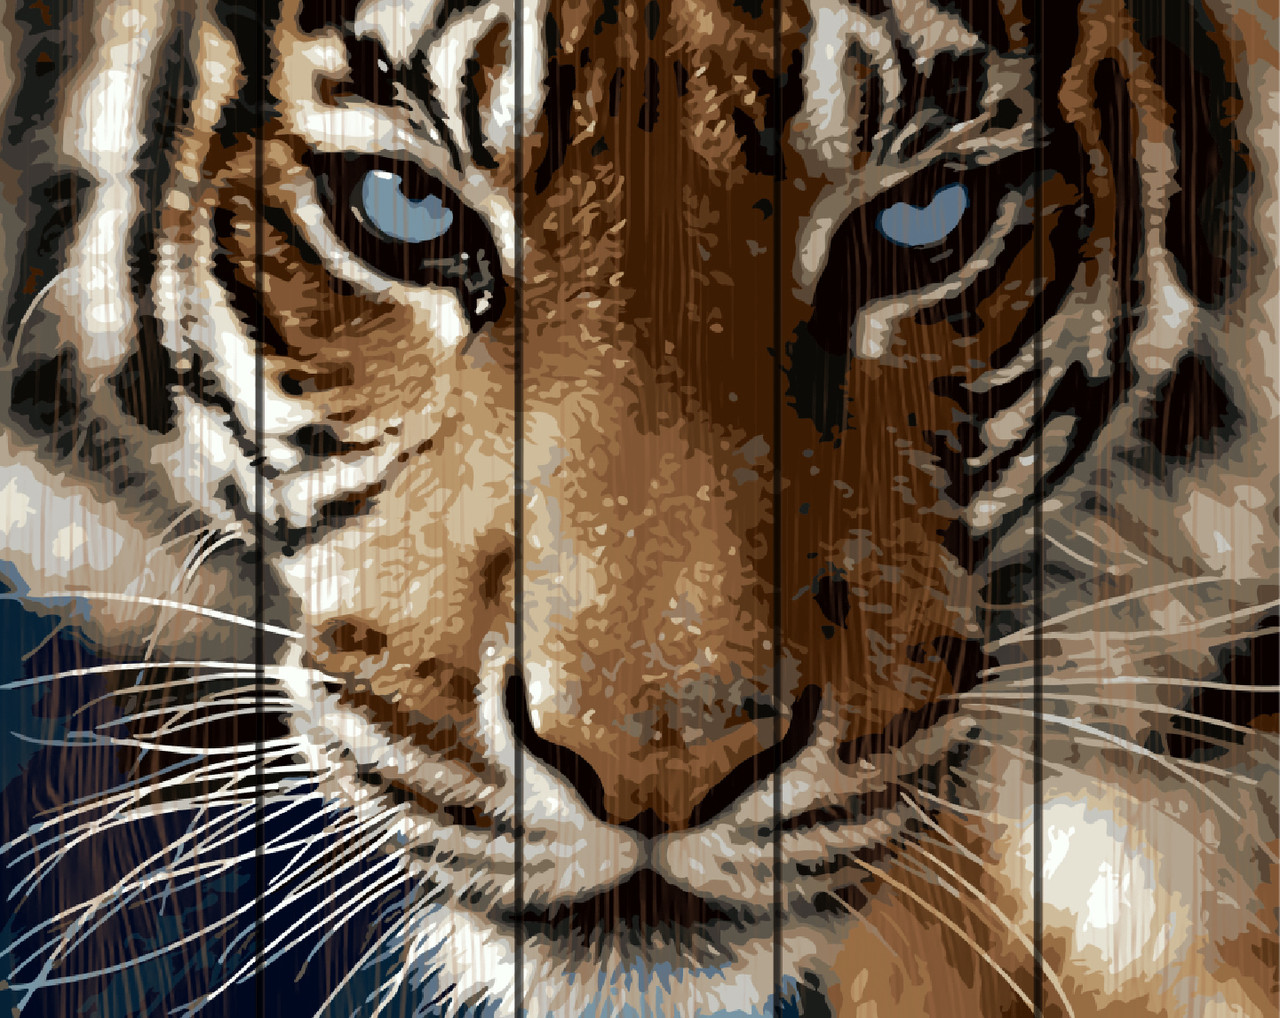 Картина по номерам на дереве 40*50см. Взгляд тигра Rainbow Art GXT8767 в подарочной коробке